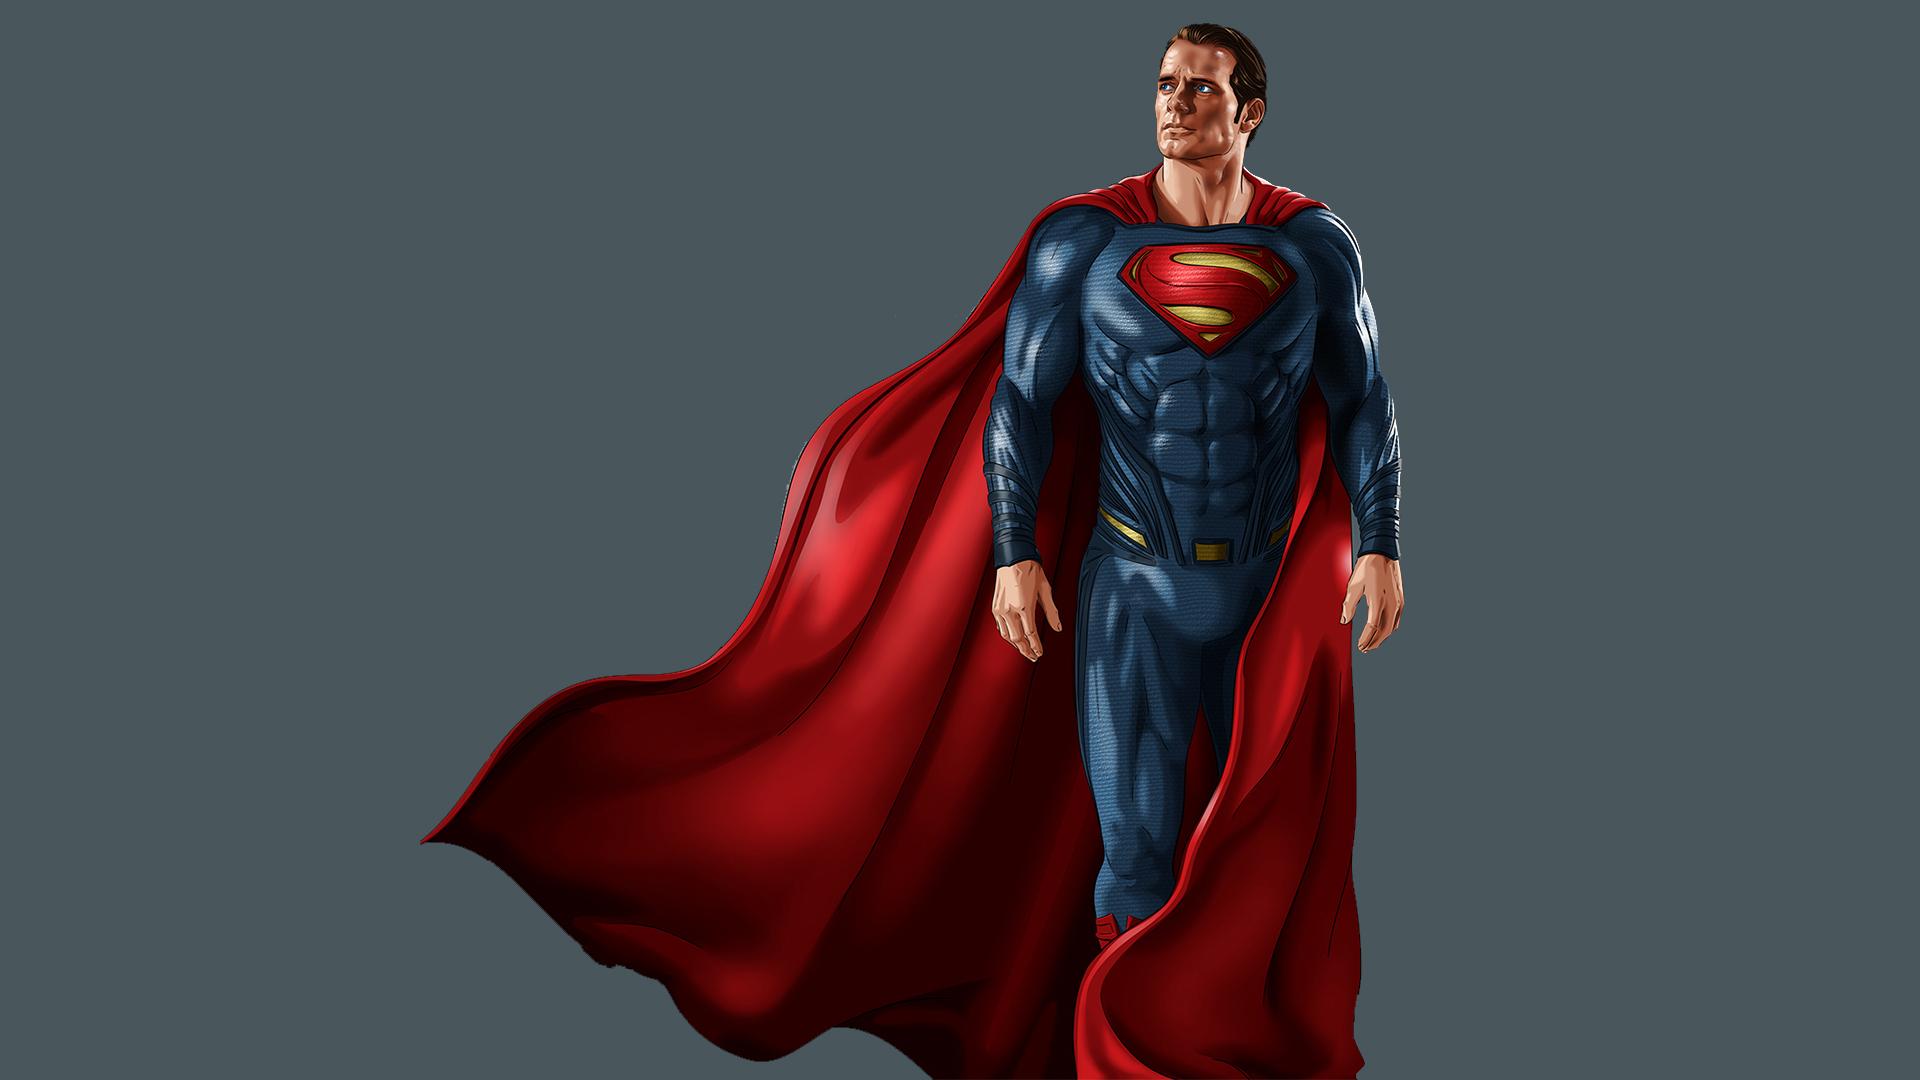 1366x768 Superman Amazing Artwork 1366x768 Resolution Hd 4k